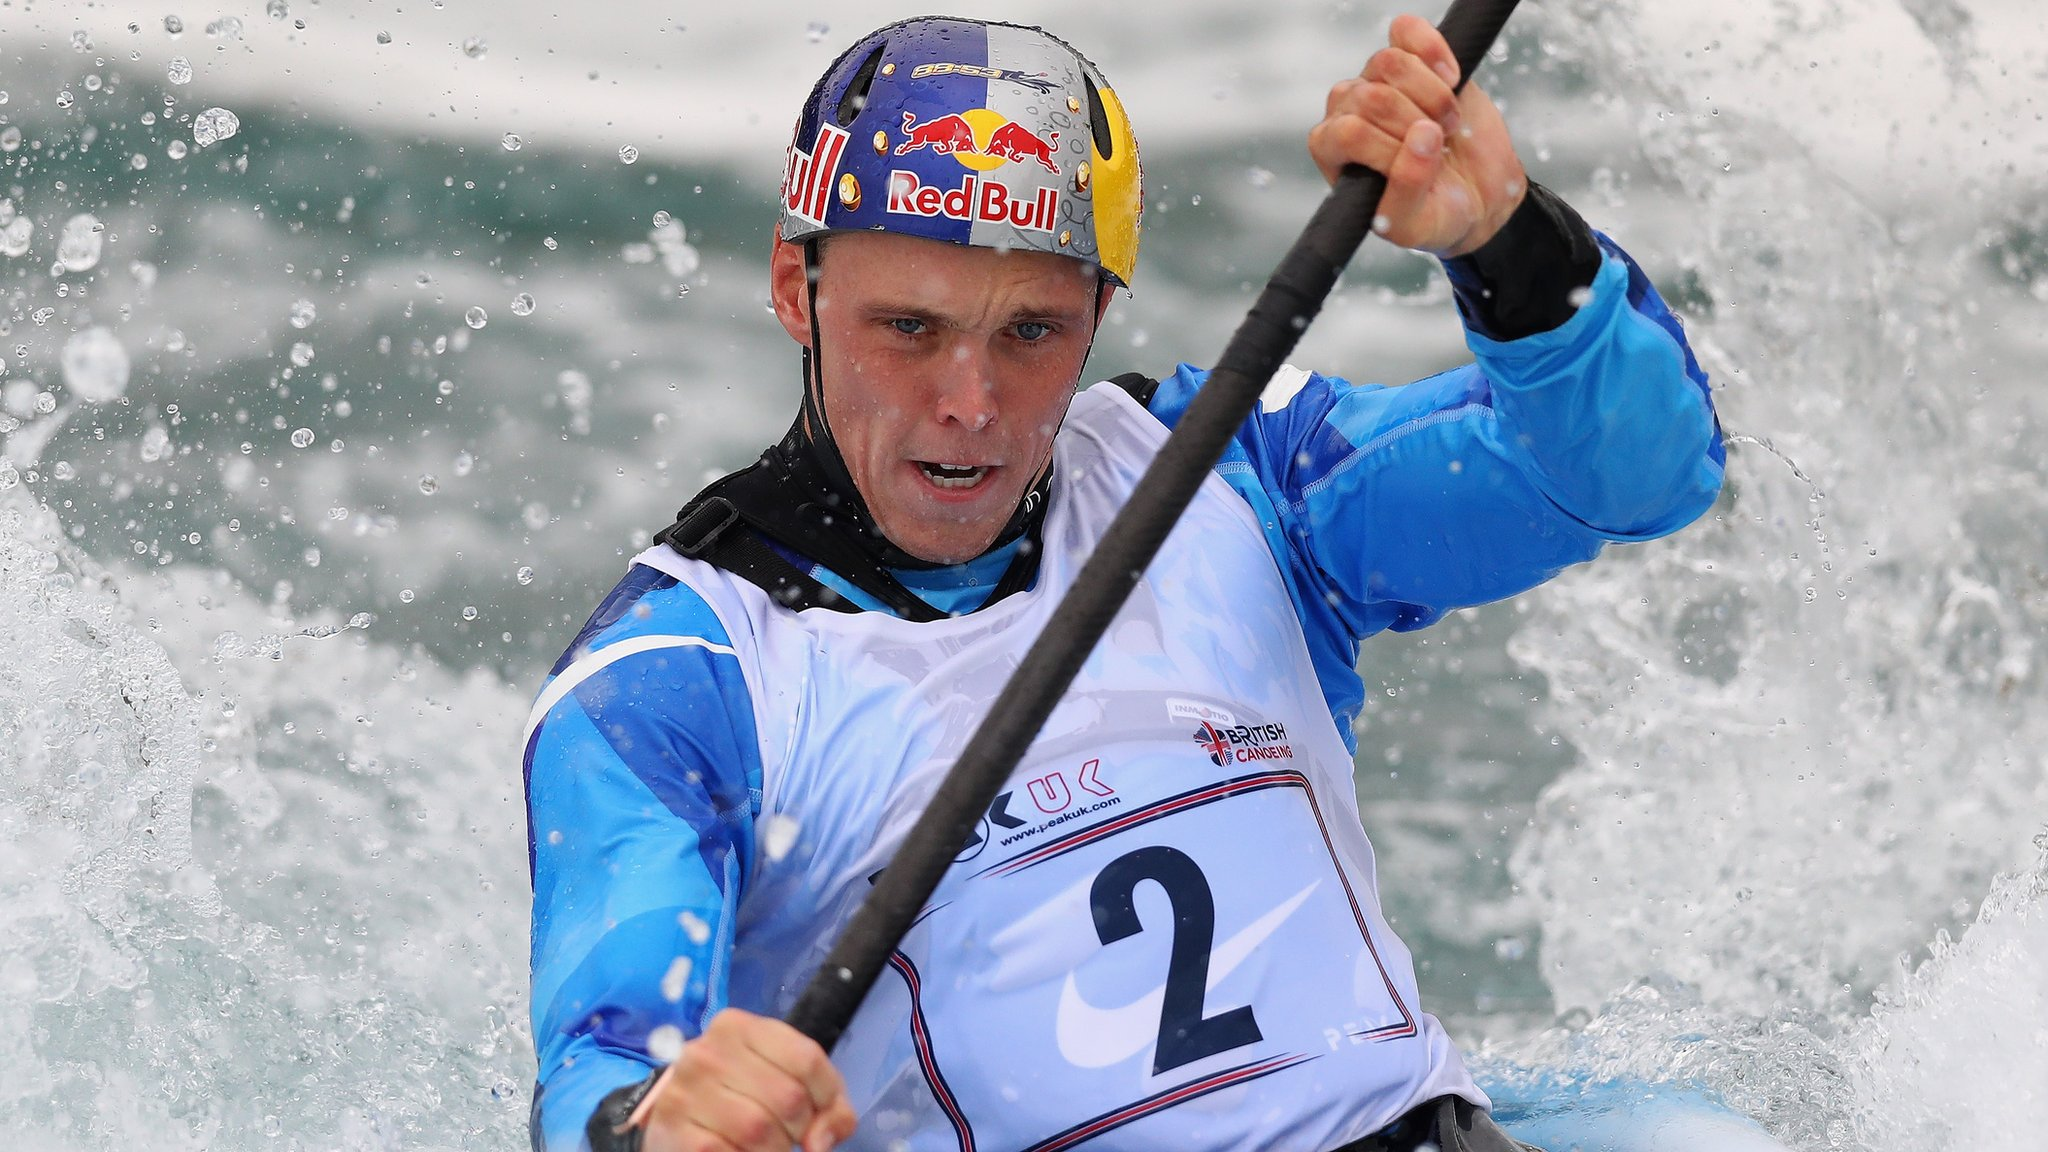 Canoe Slalom World Championships: Joe Clarke ready to challenge after 'building from zero'